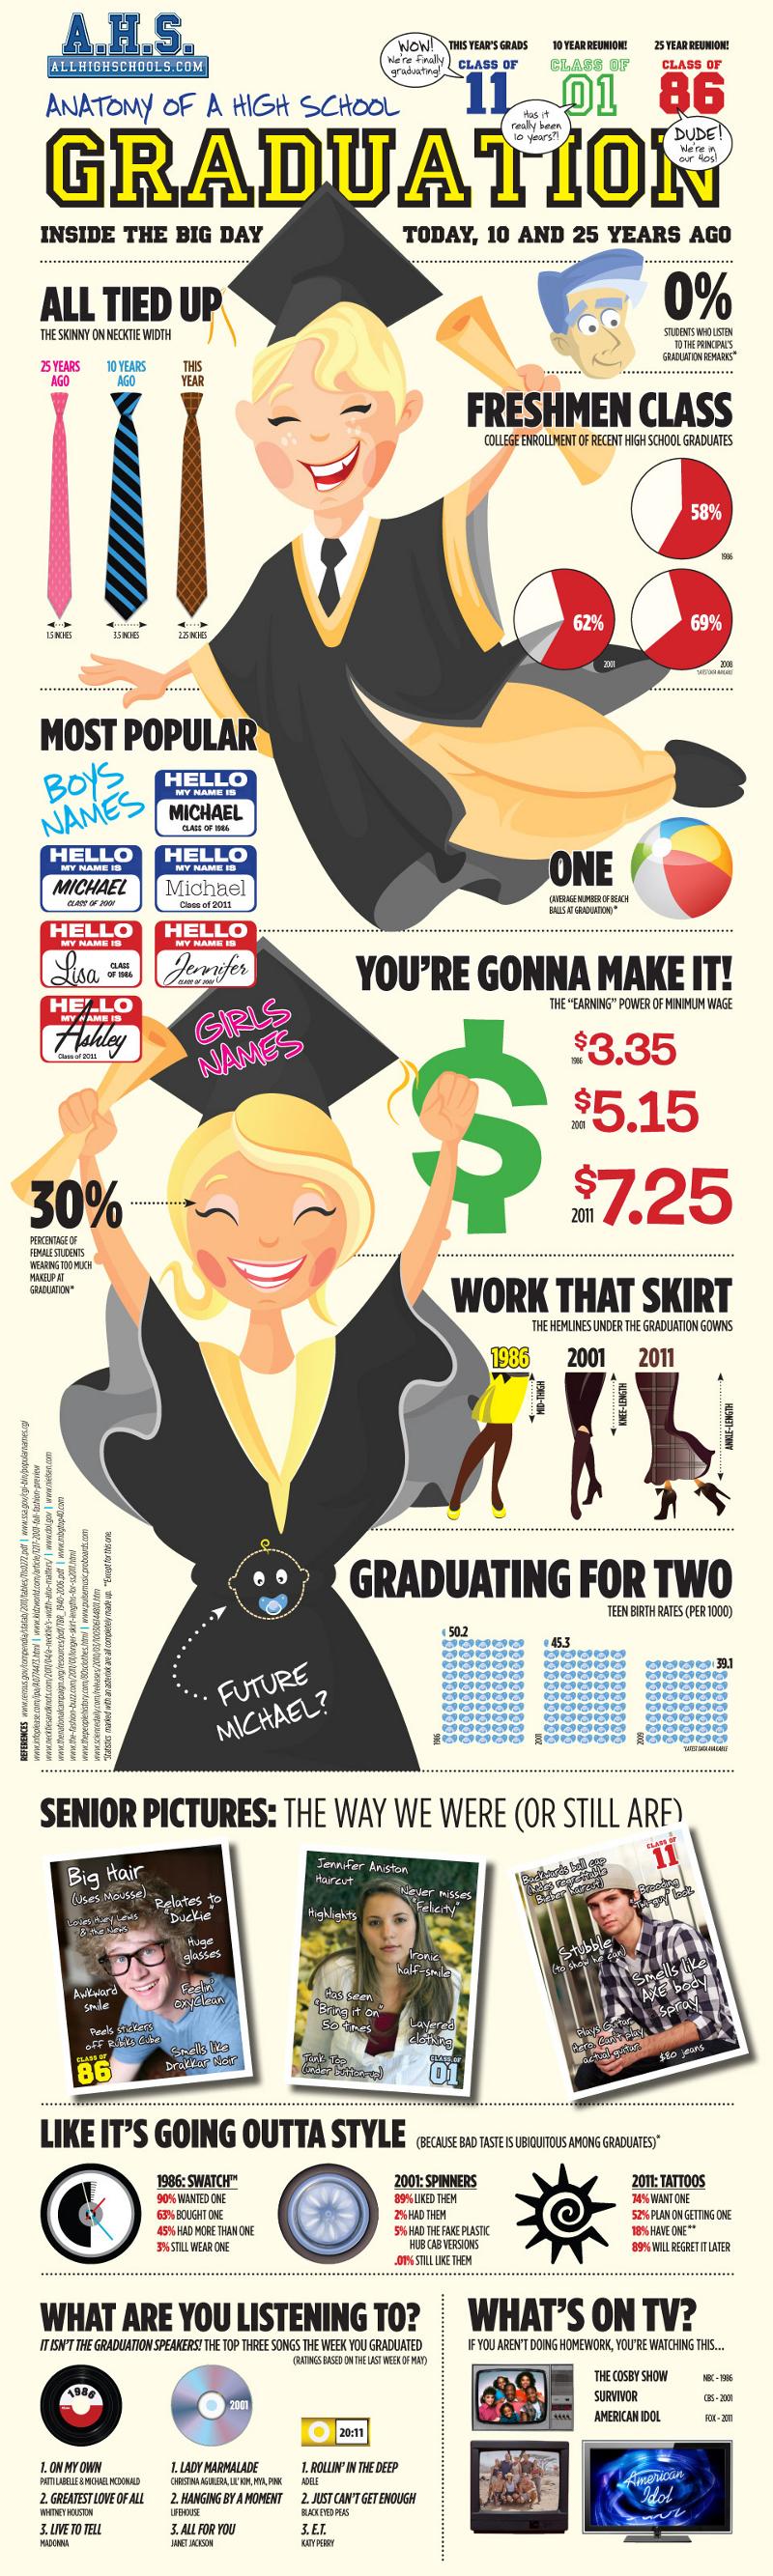 Graduation Historic Trends